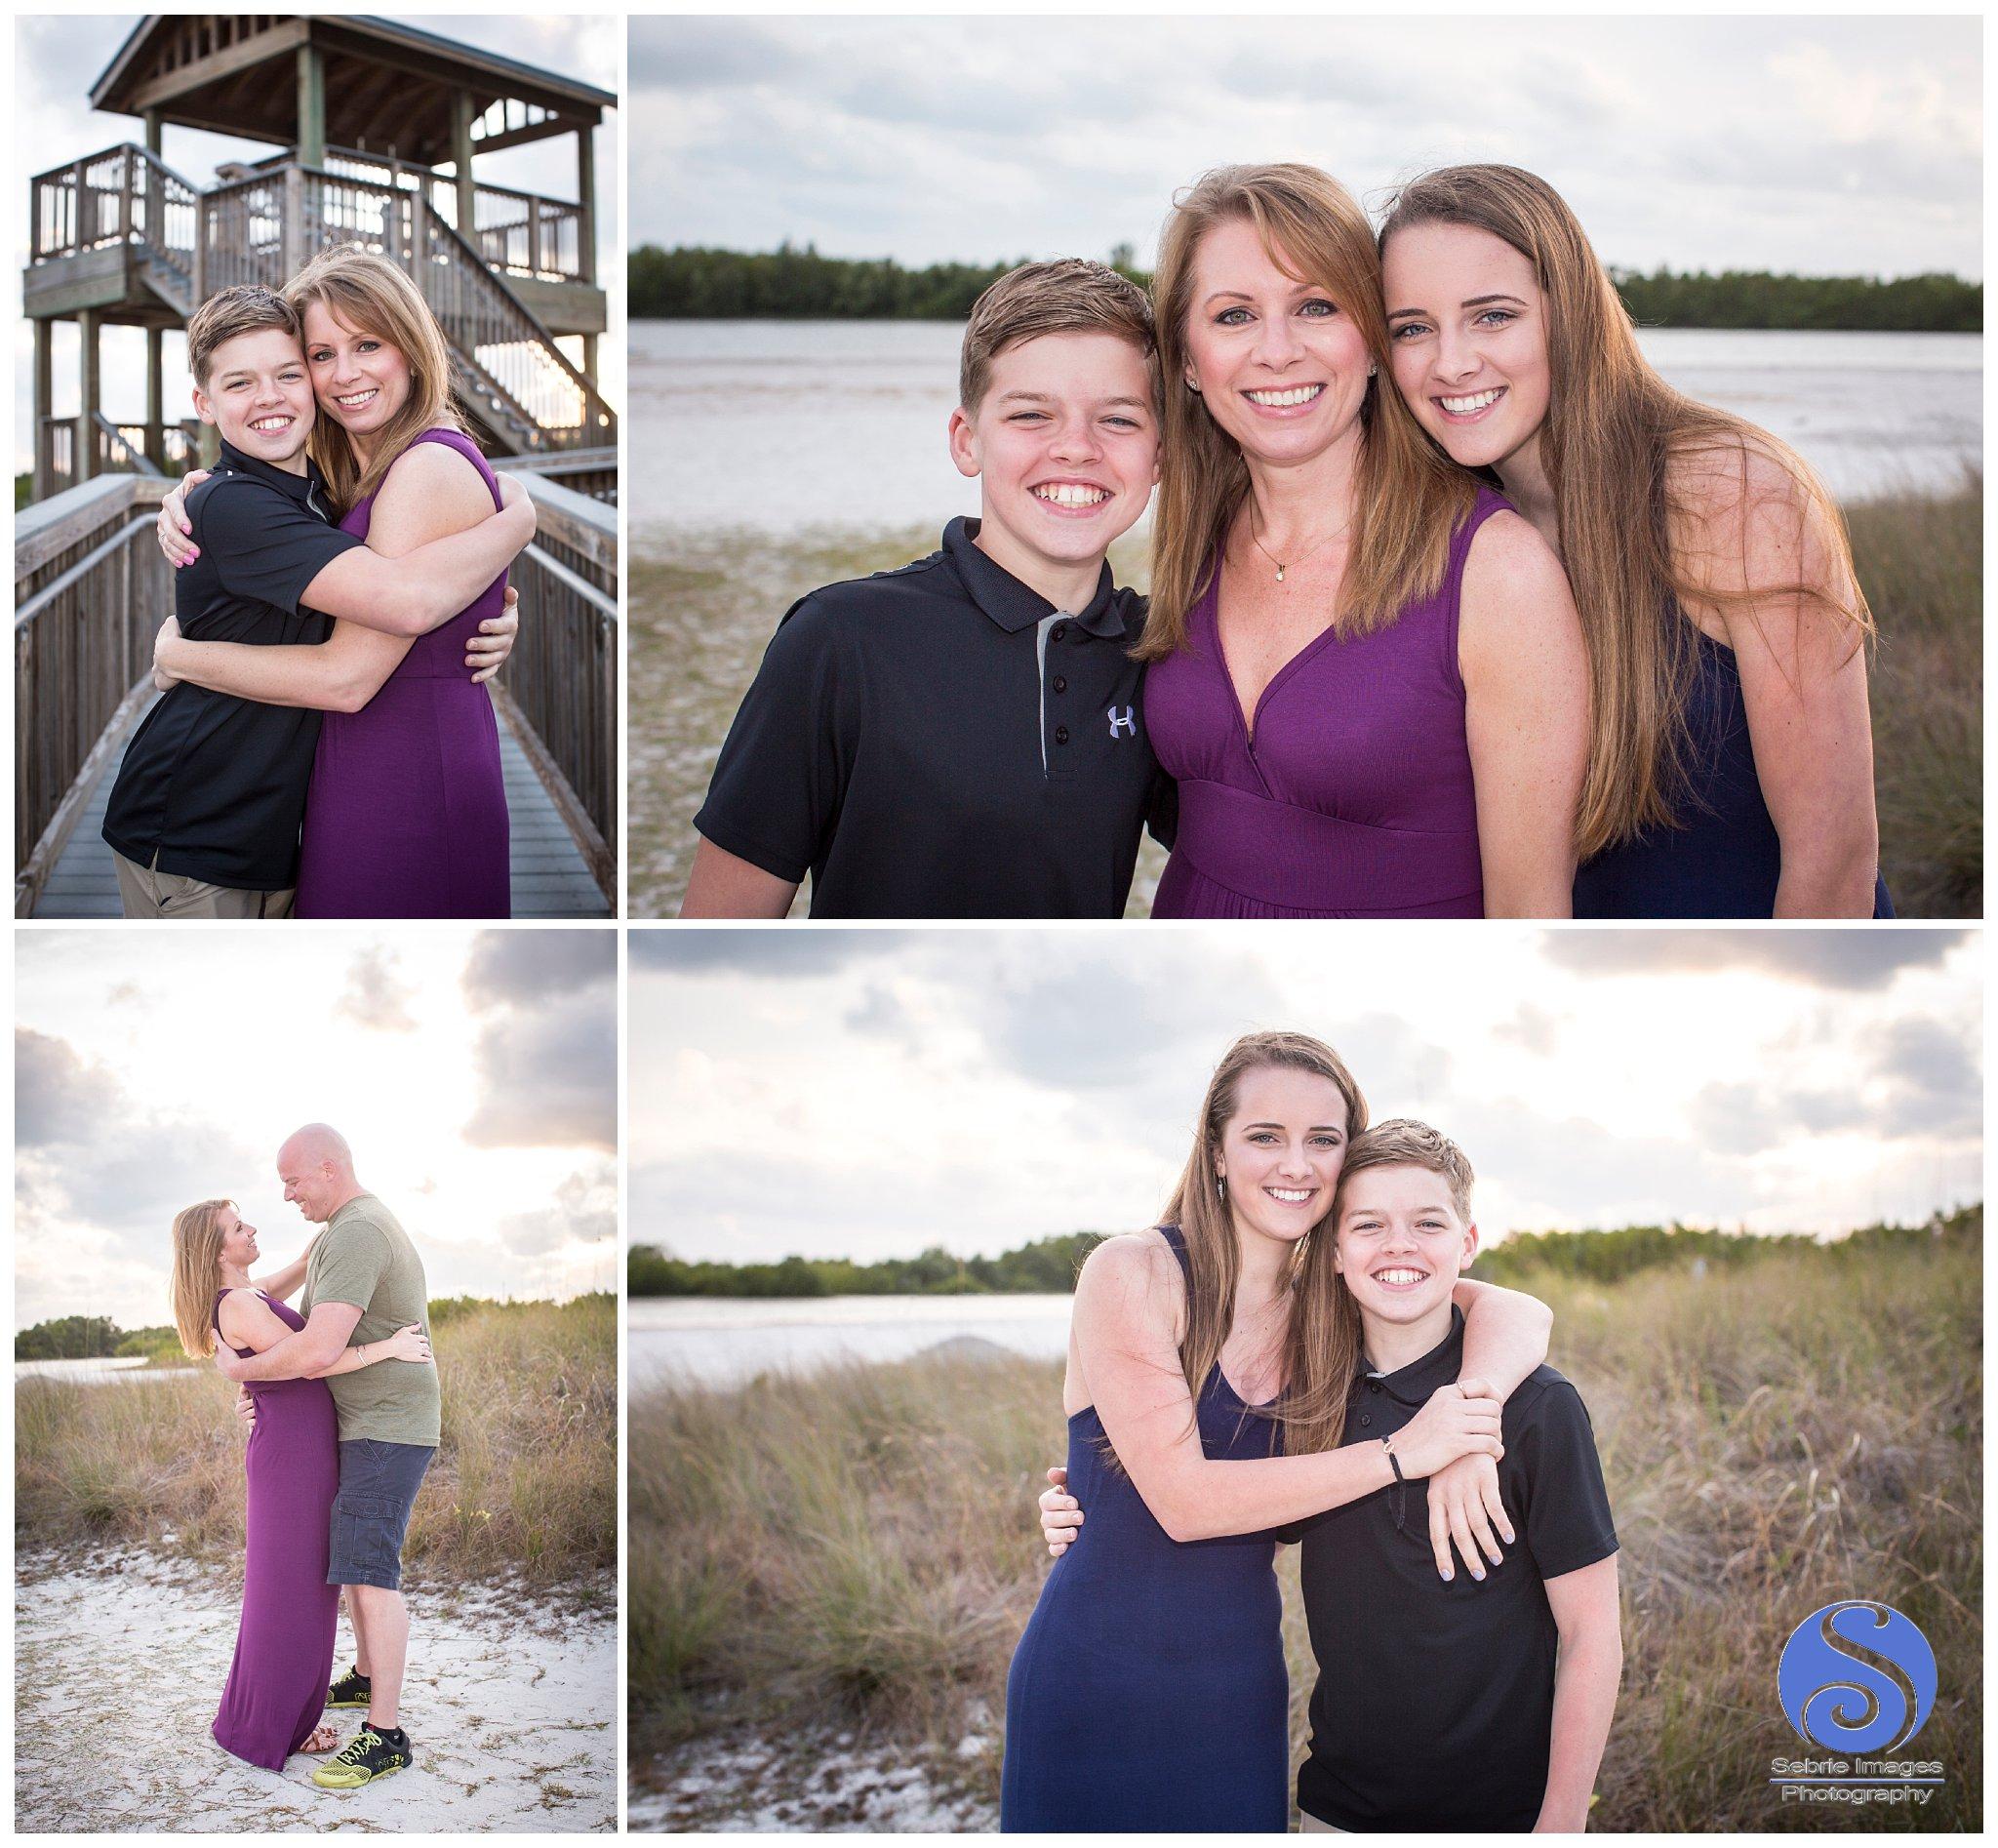 Family Portraits at Marco Island, FL